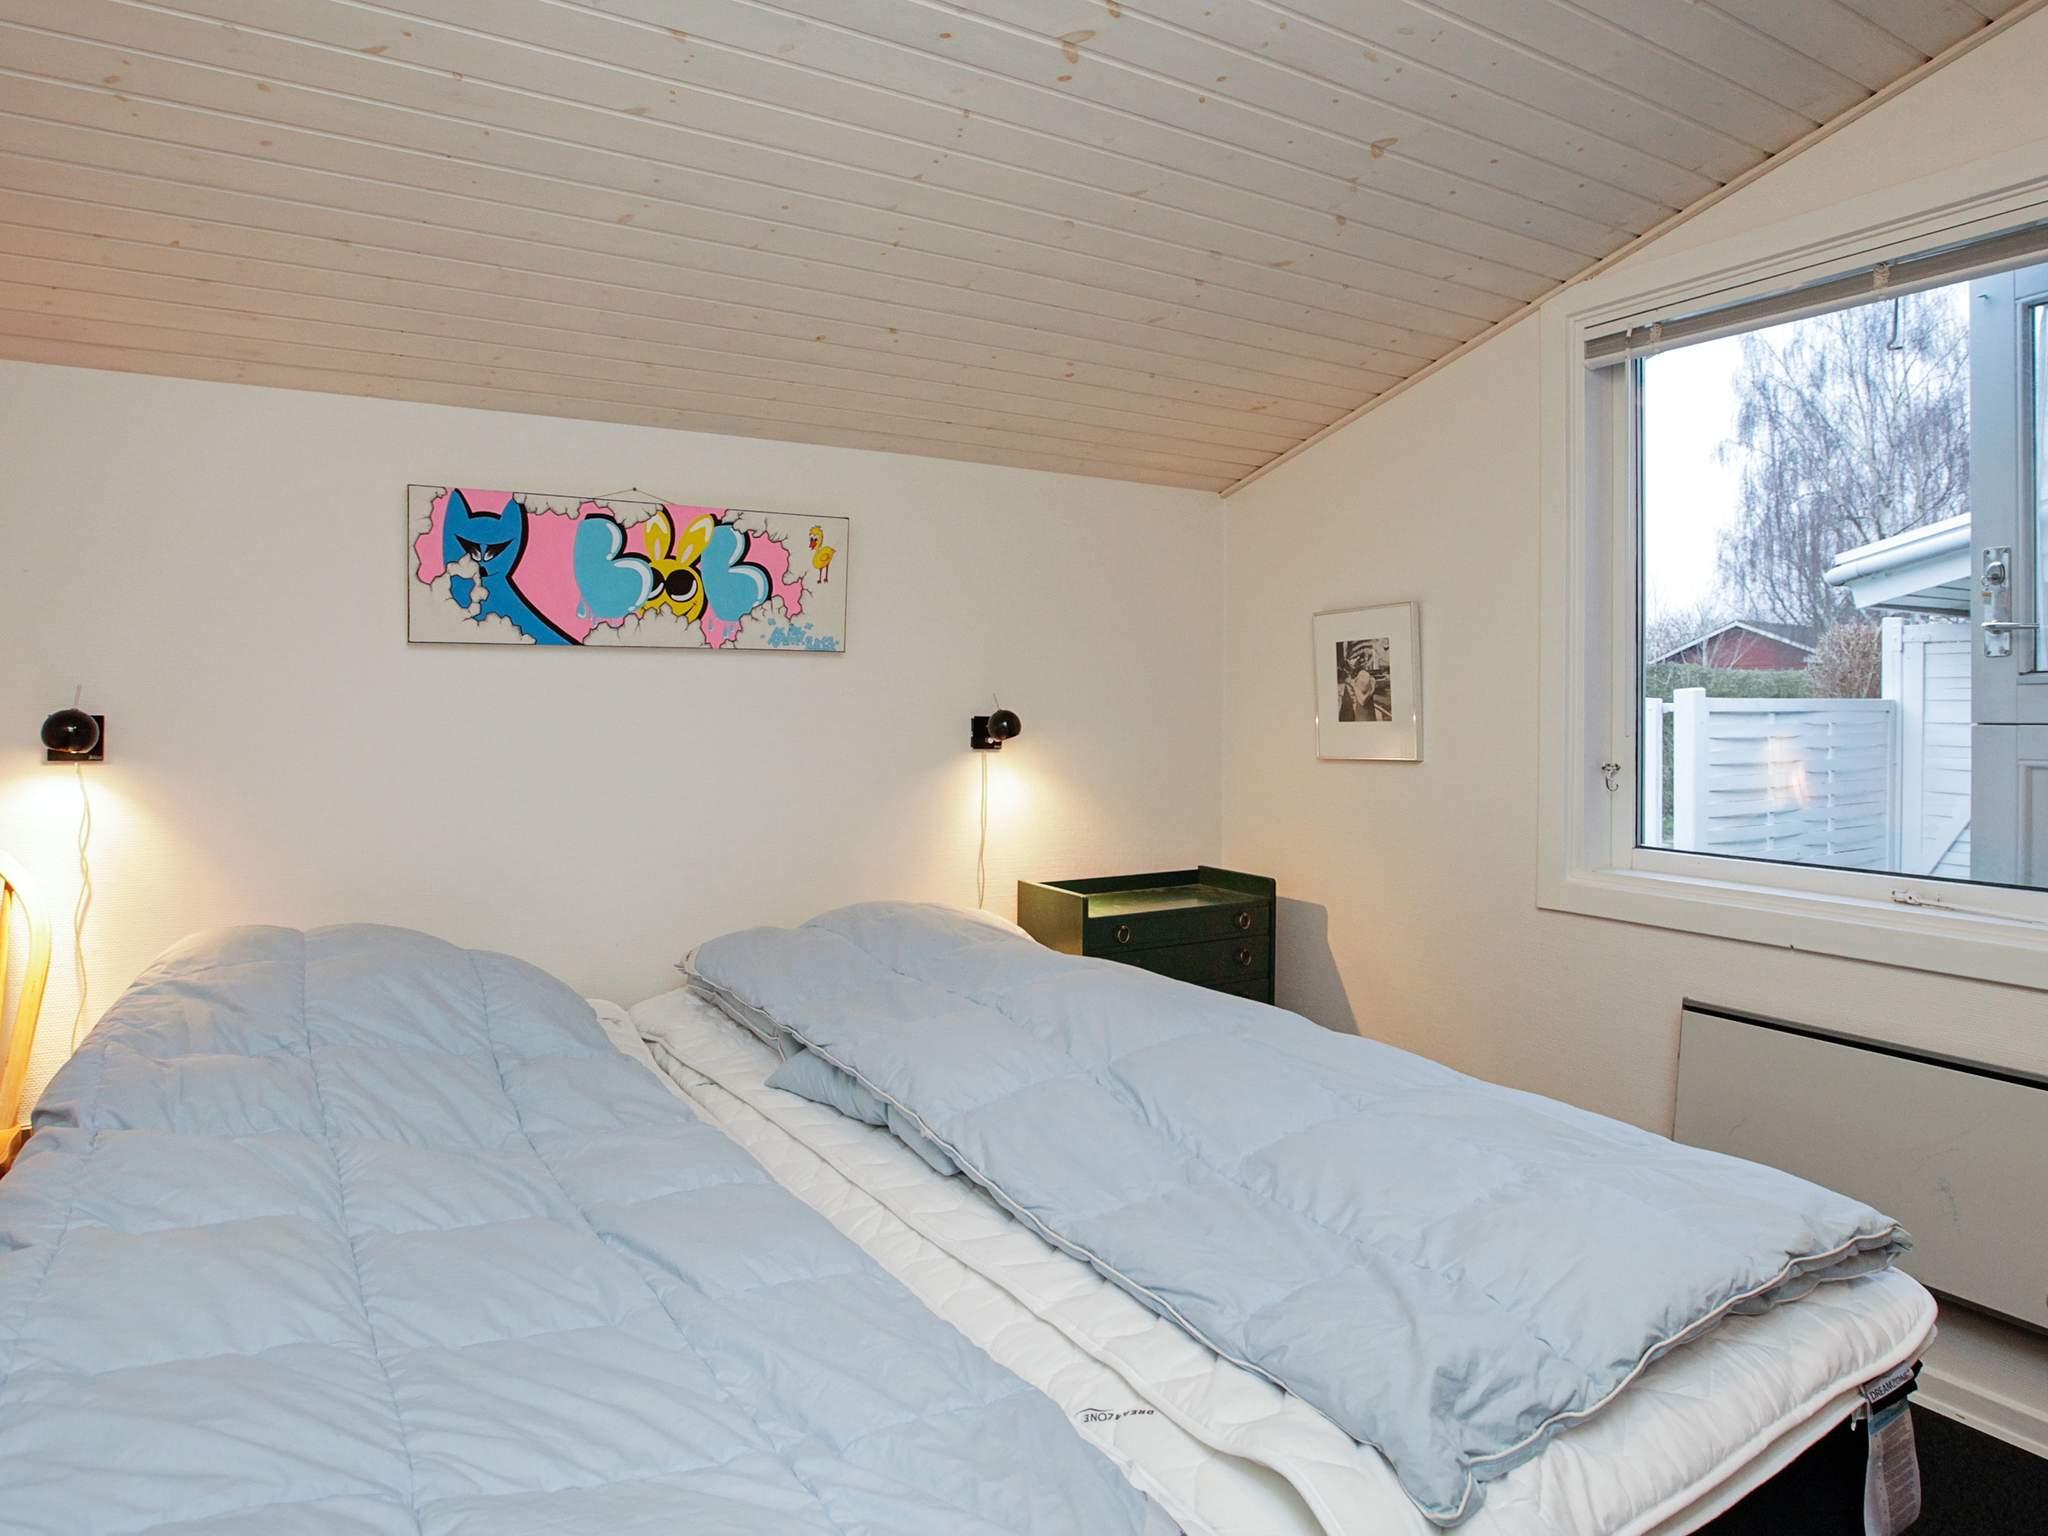 Ferienhaus Tåsinge/Stenodden (87563), Svendborg, , Fünen, Dänemark, Bild 11